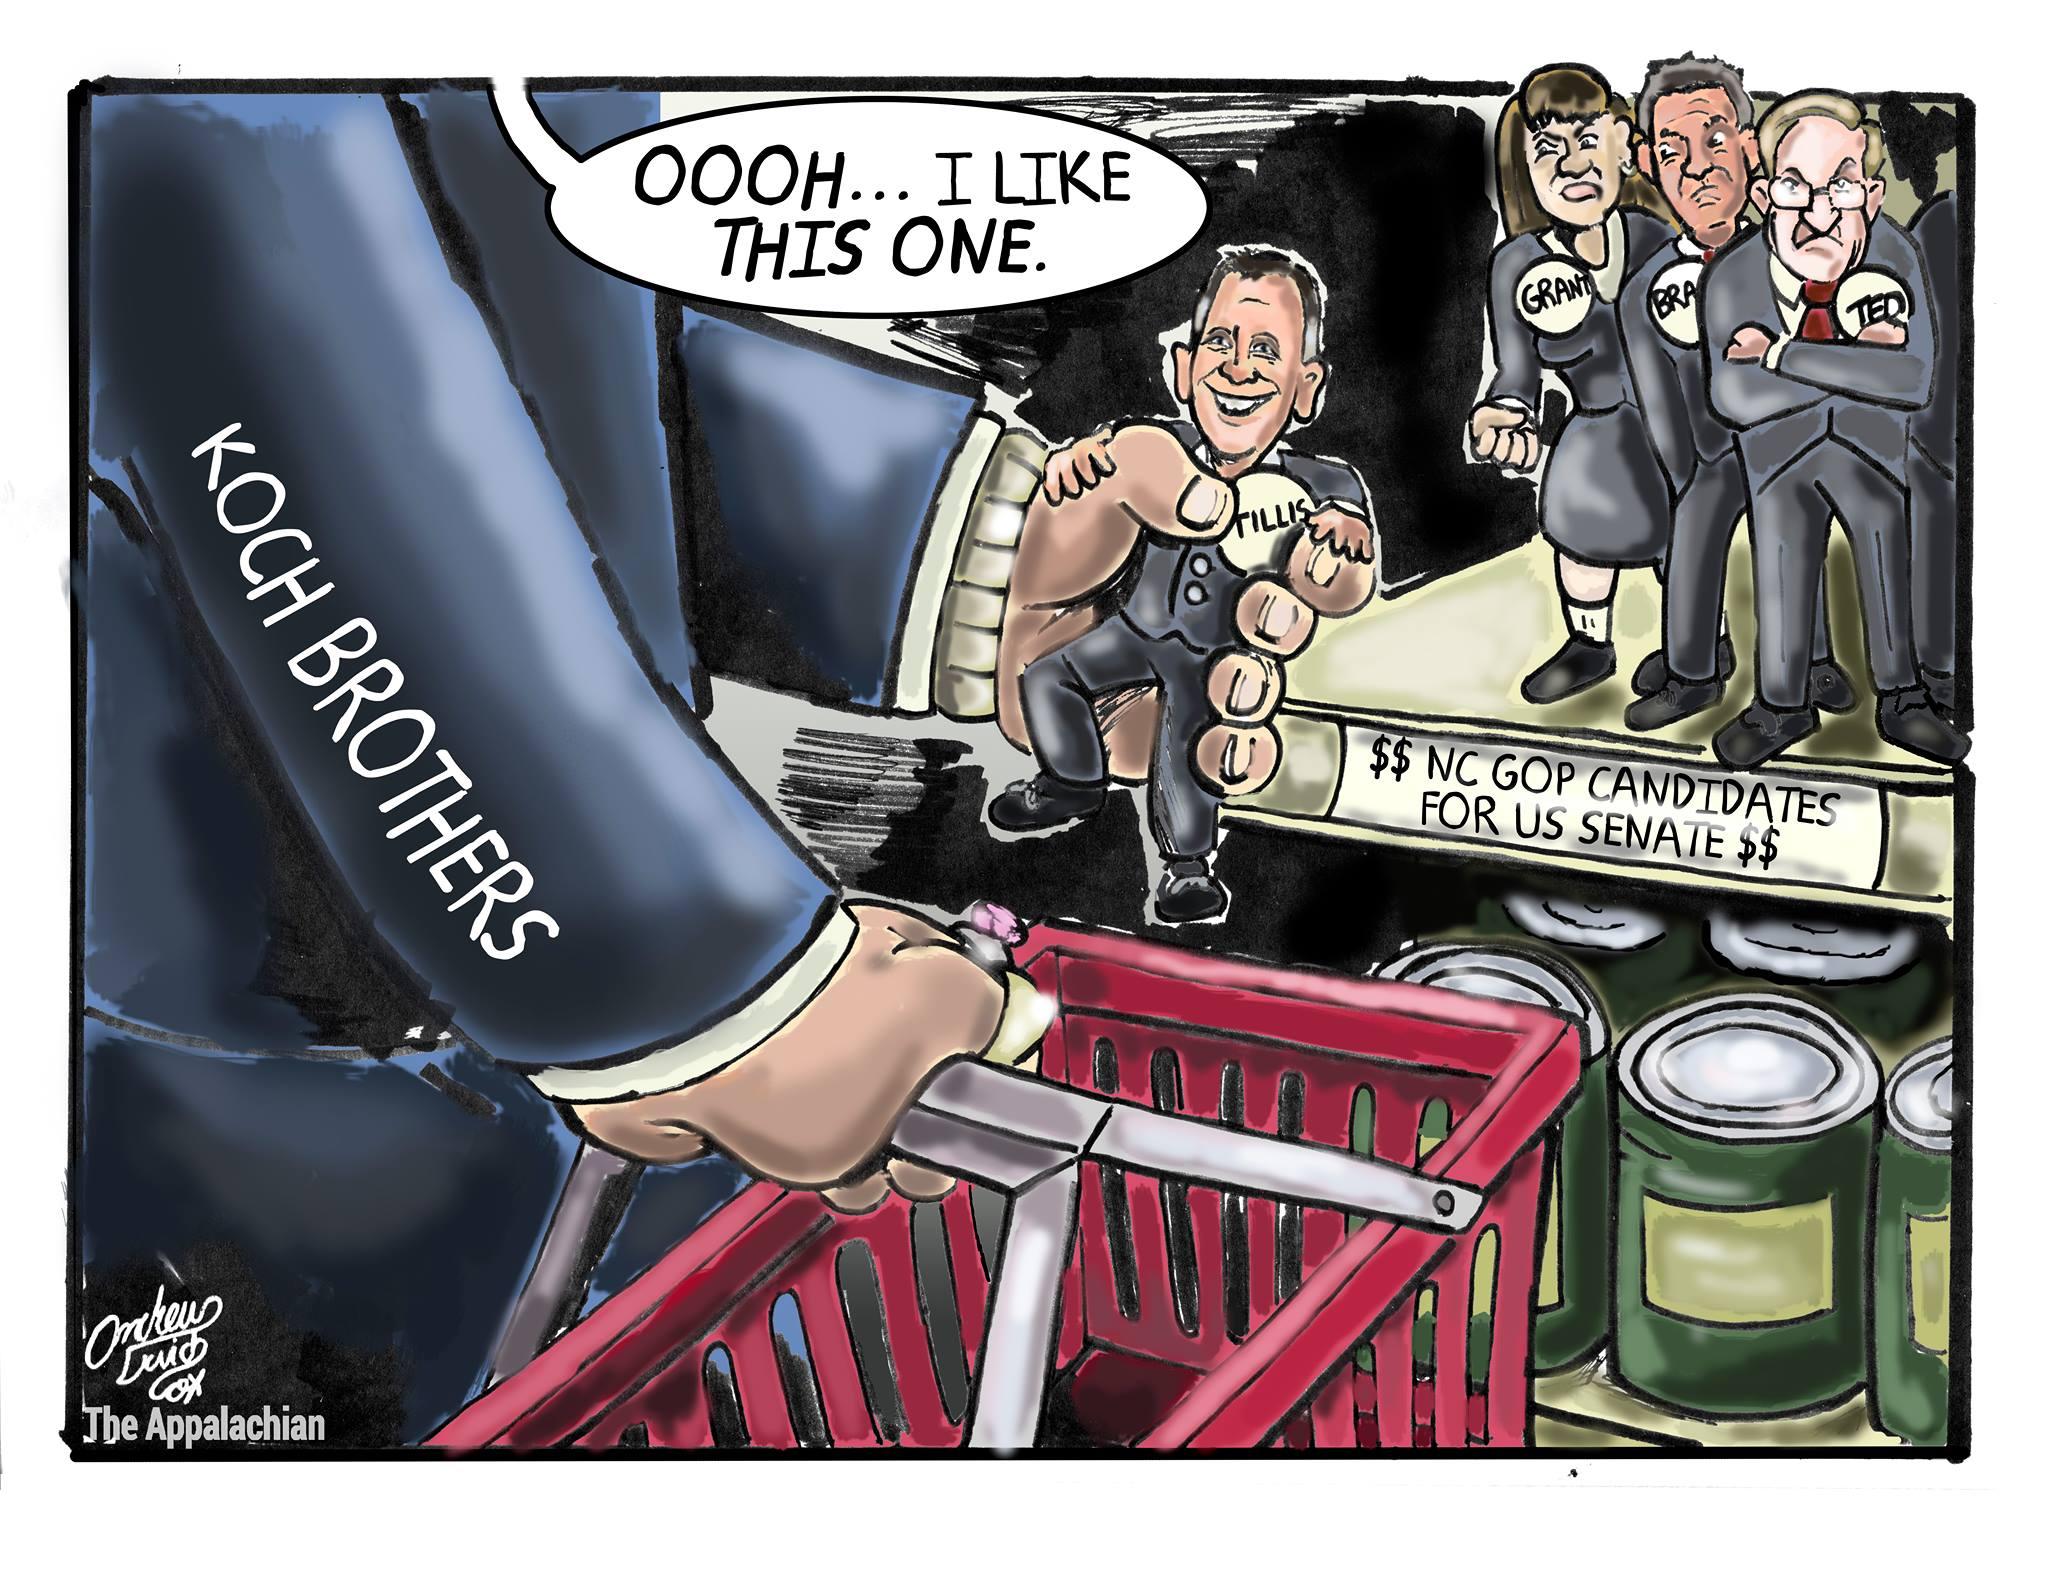 Koch brothers shopping for senators